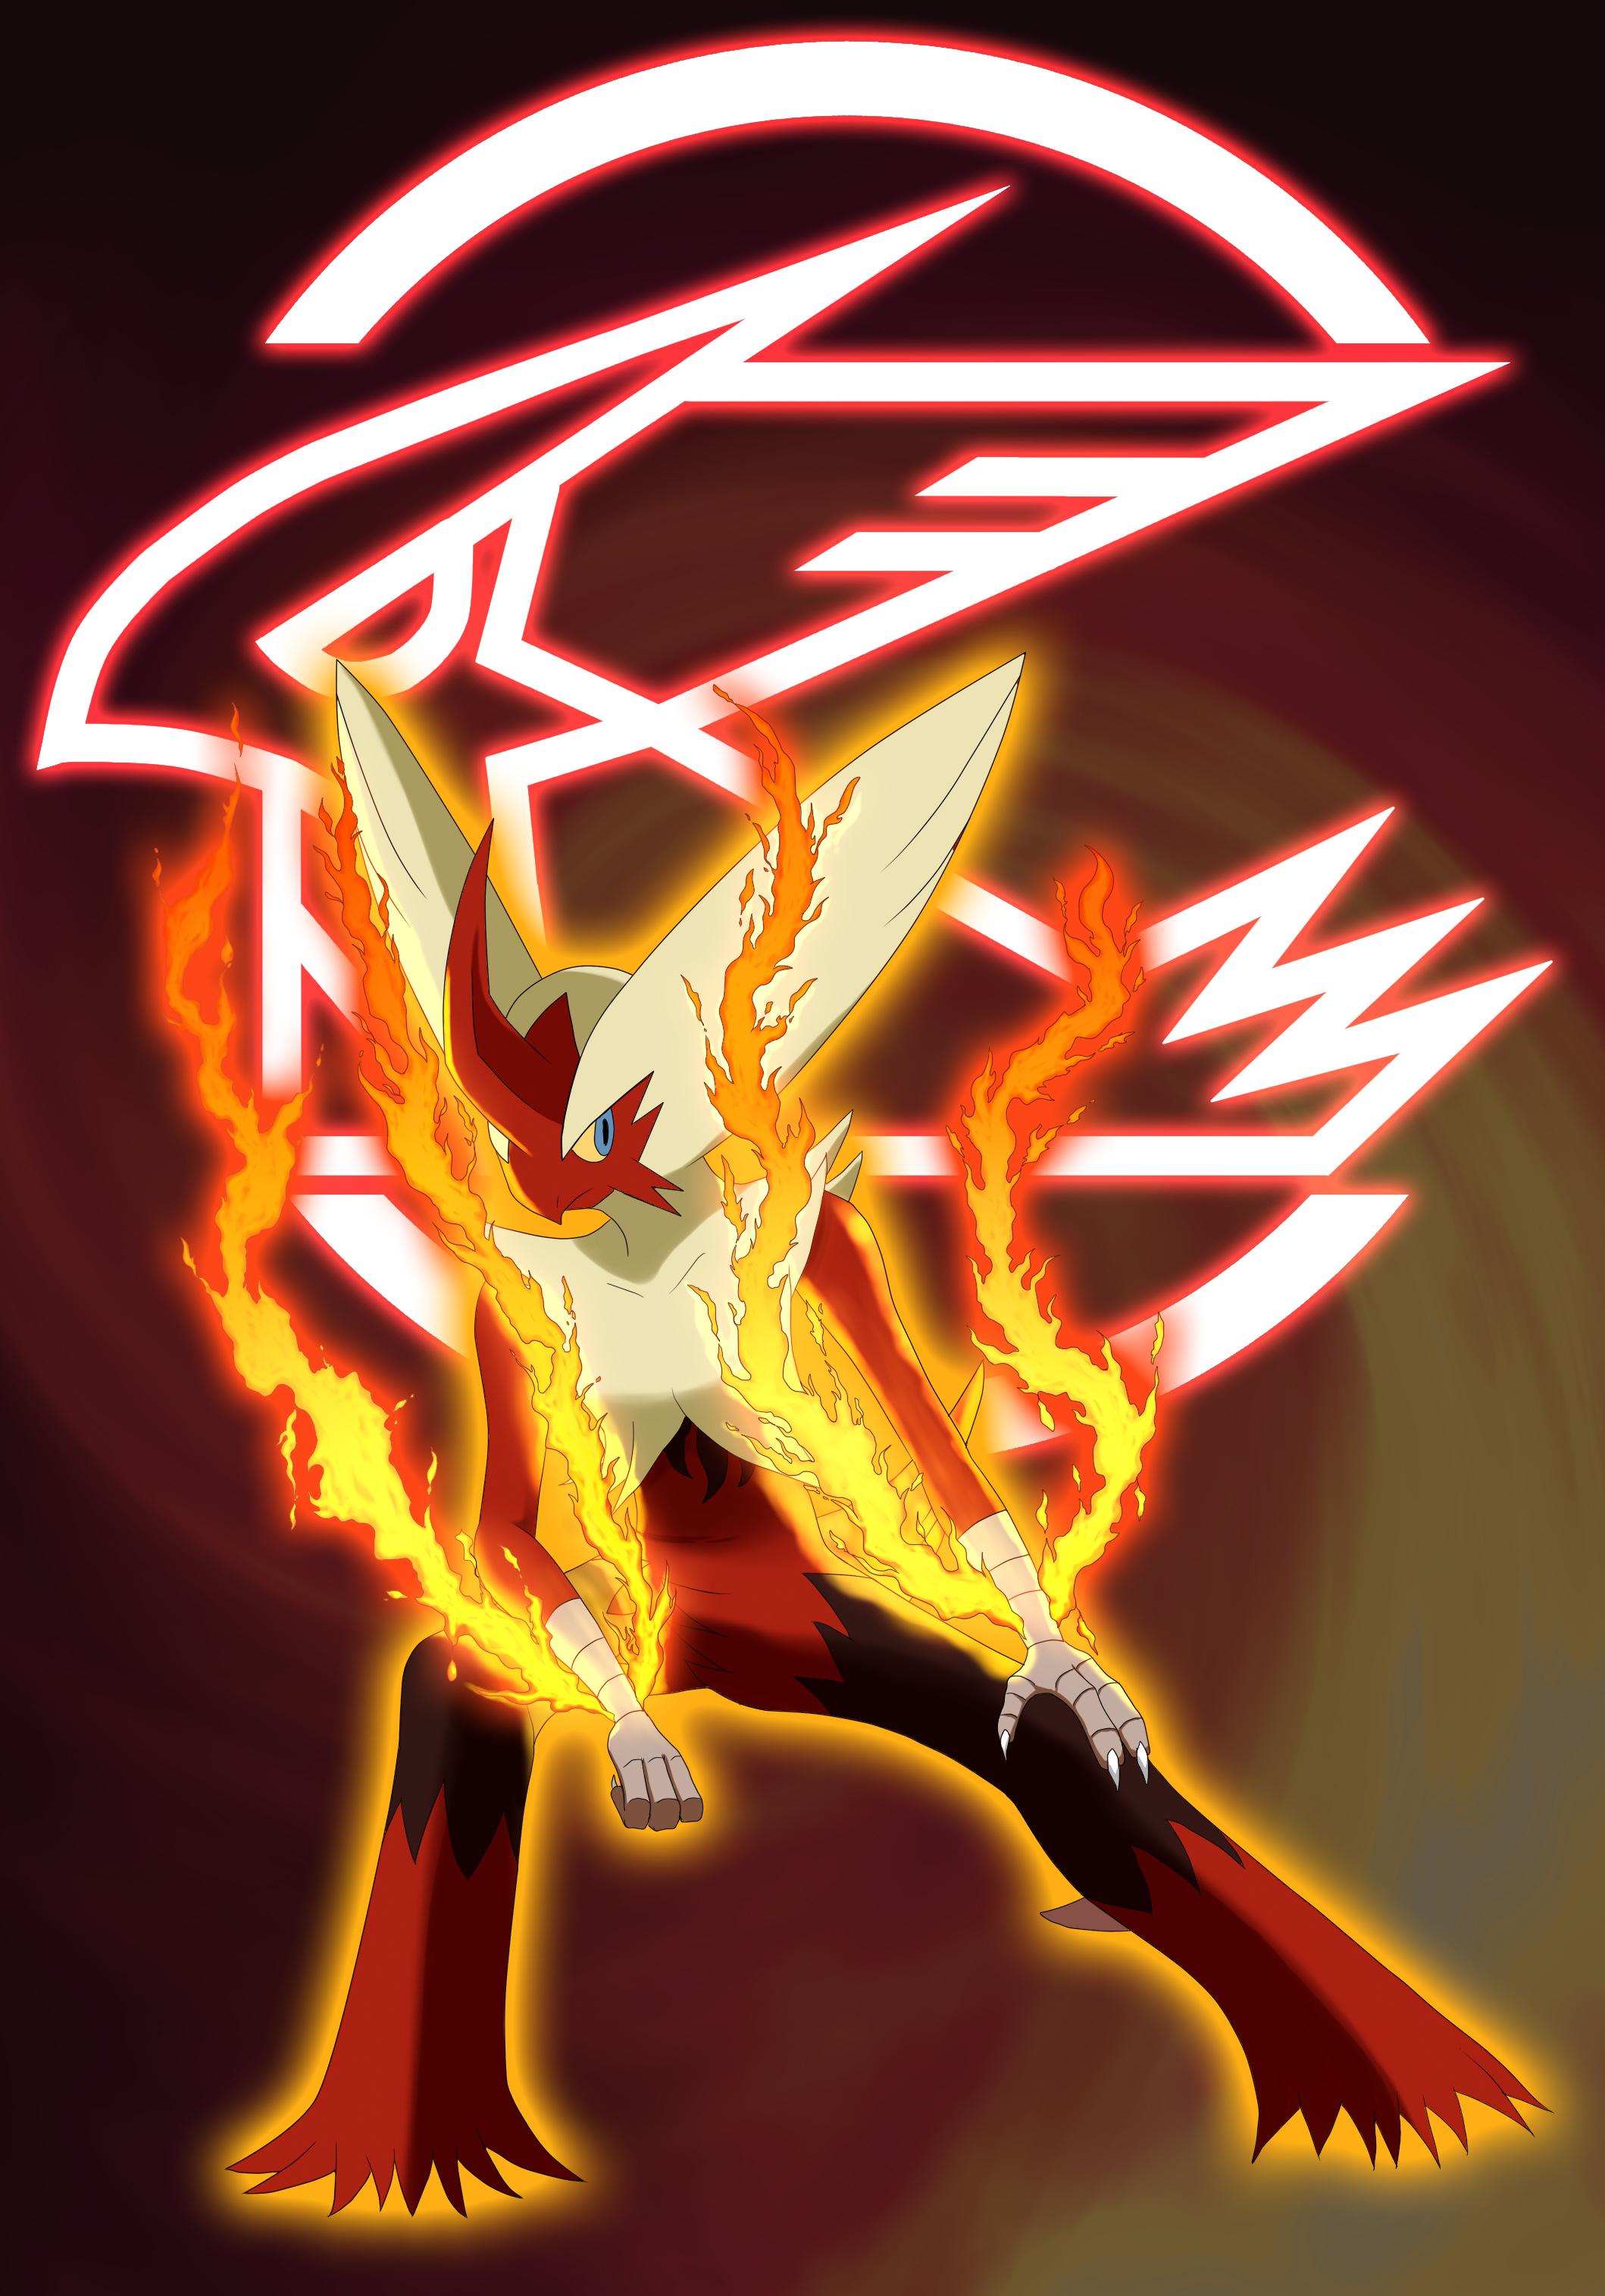 Surprise Blaze ひと勝負付き合えよ ストリクス 創作sns